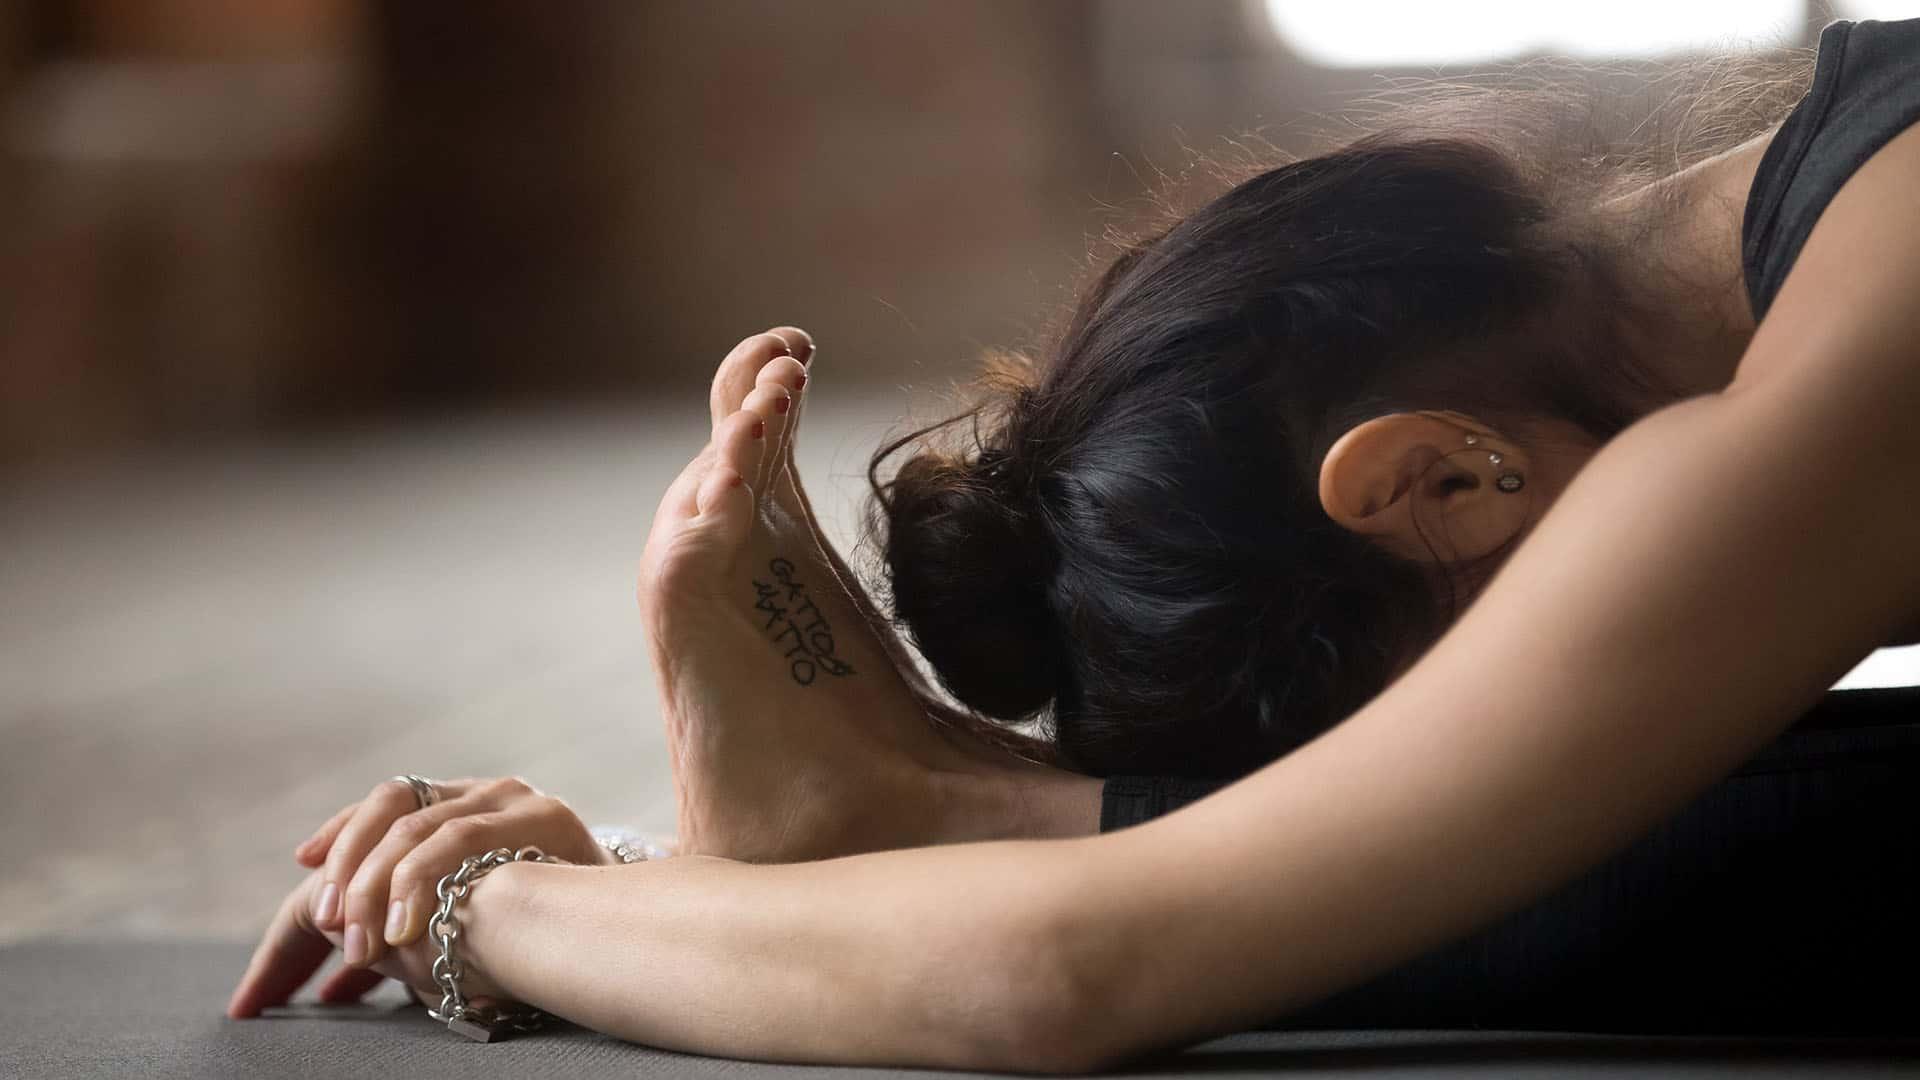 Releasing emotions through Yoga